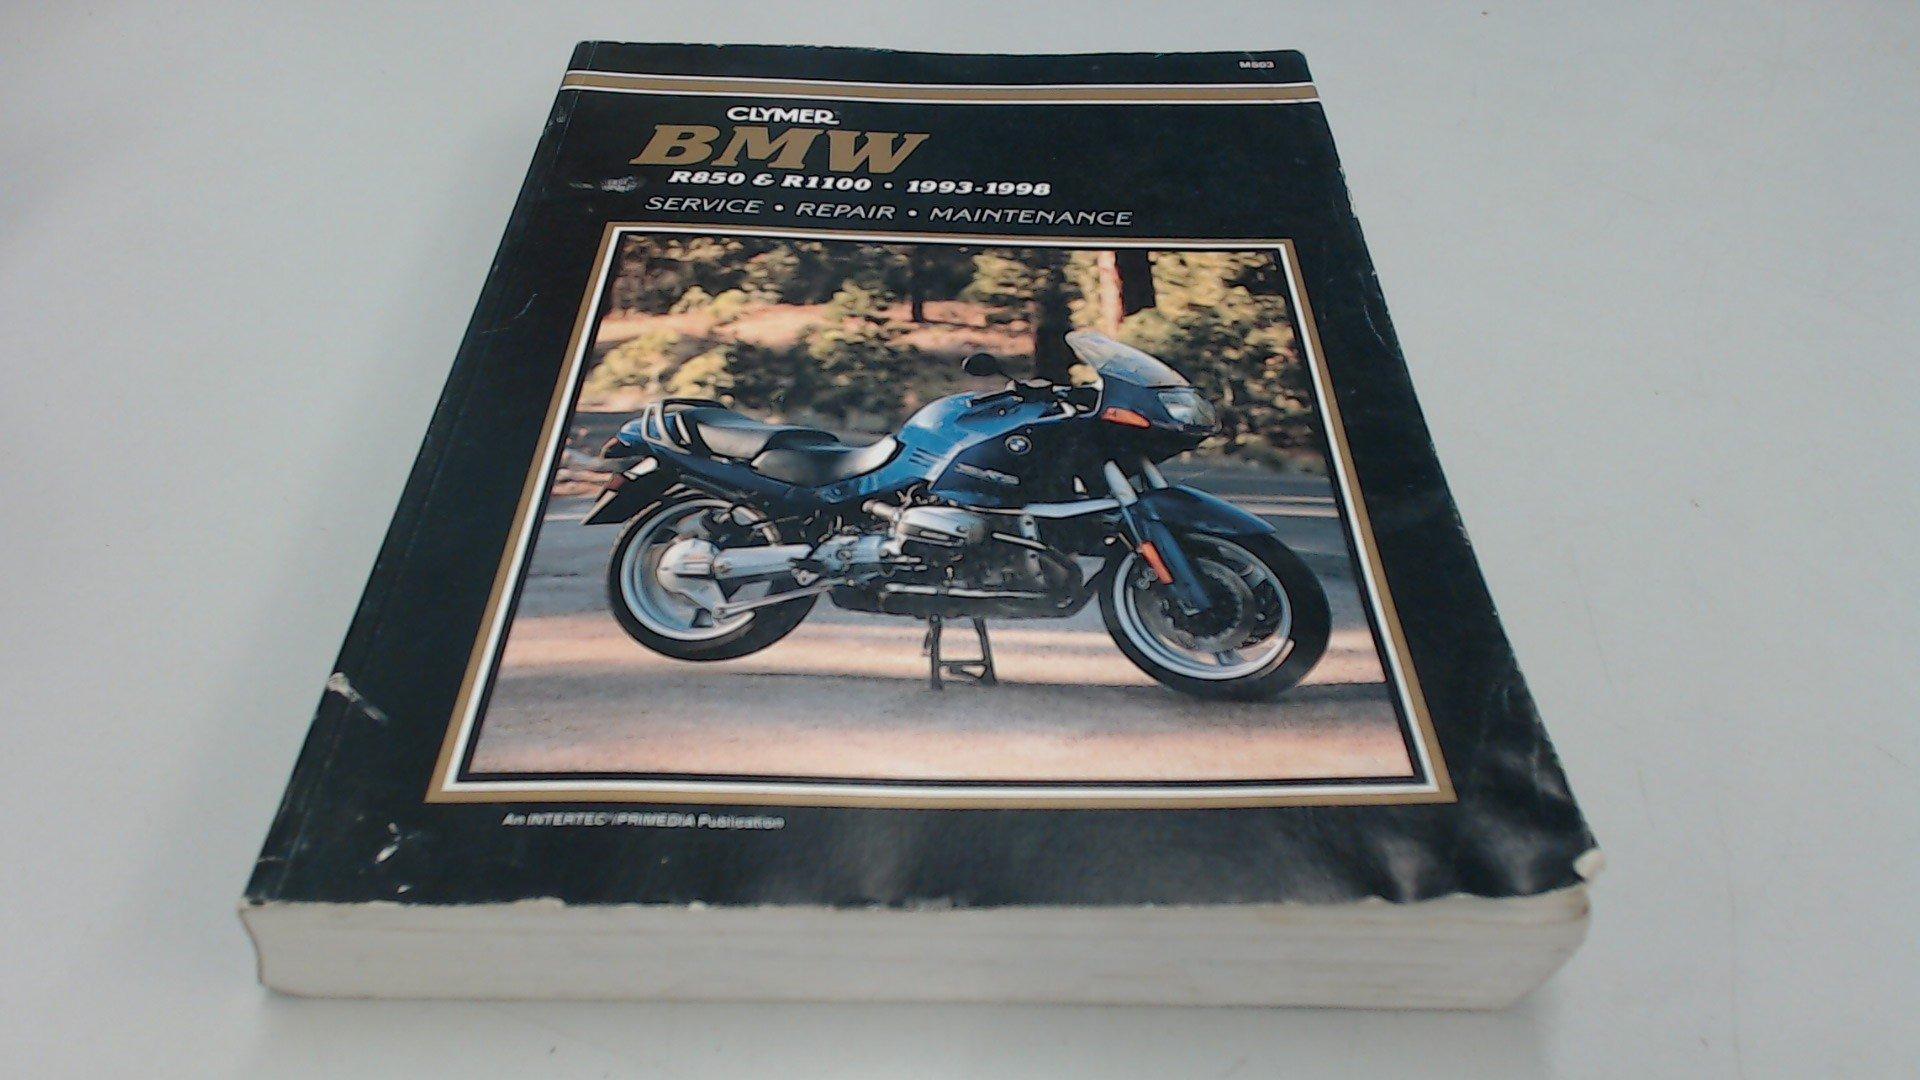 Clymer BMW R850 & R1100, 1993-1998: Service, Repair, Maintenance:  Anonymous: 9780892877201: Amazon.com: Books